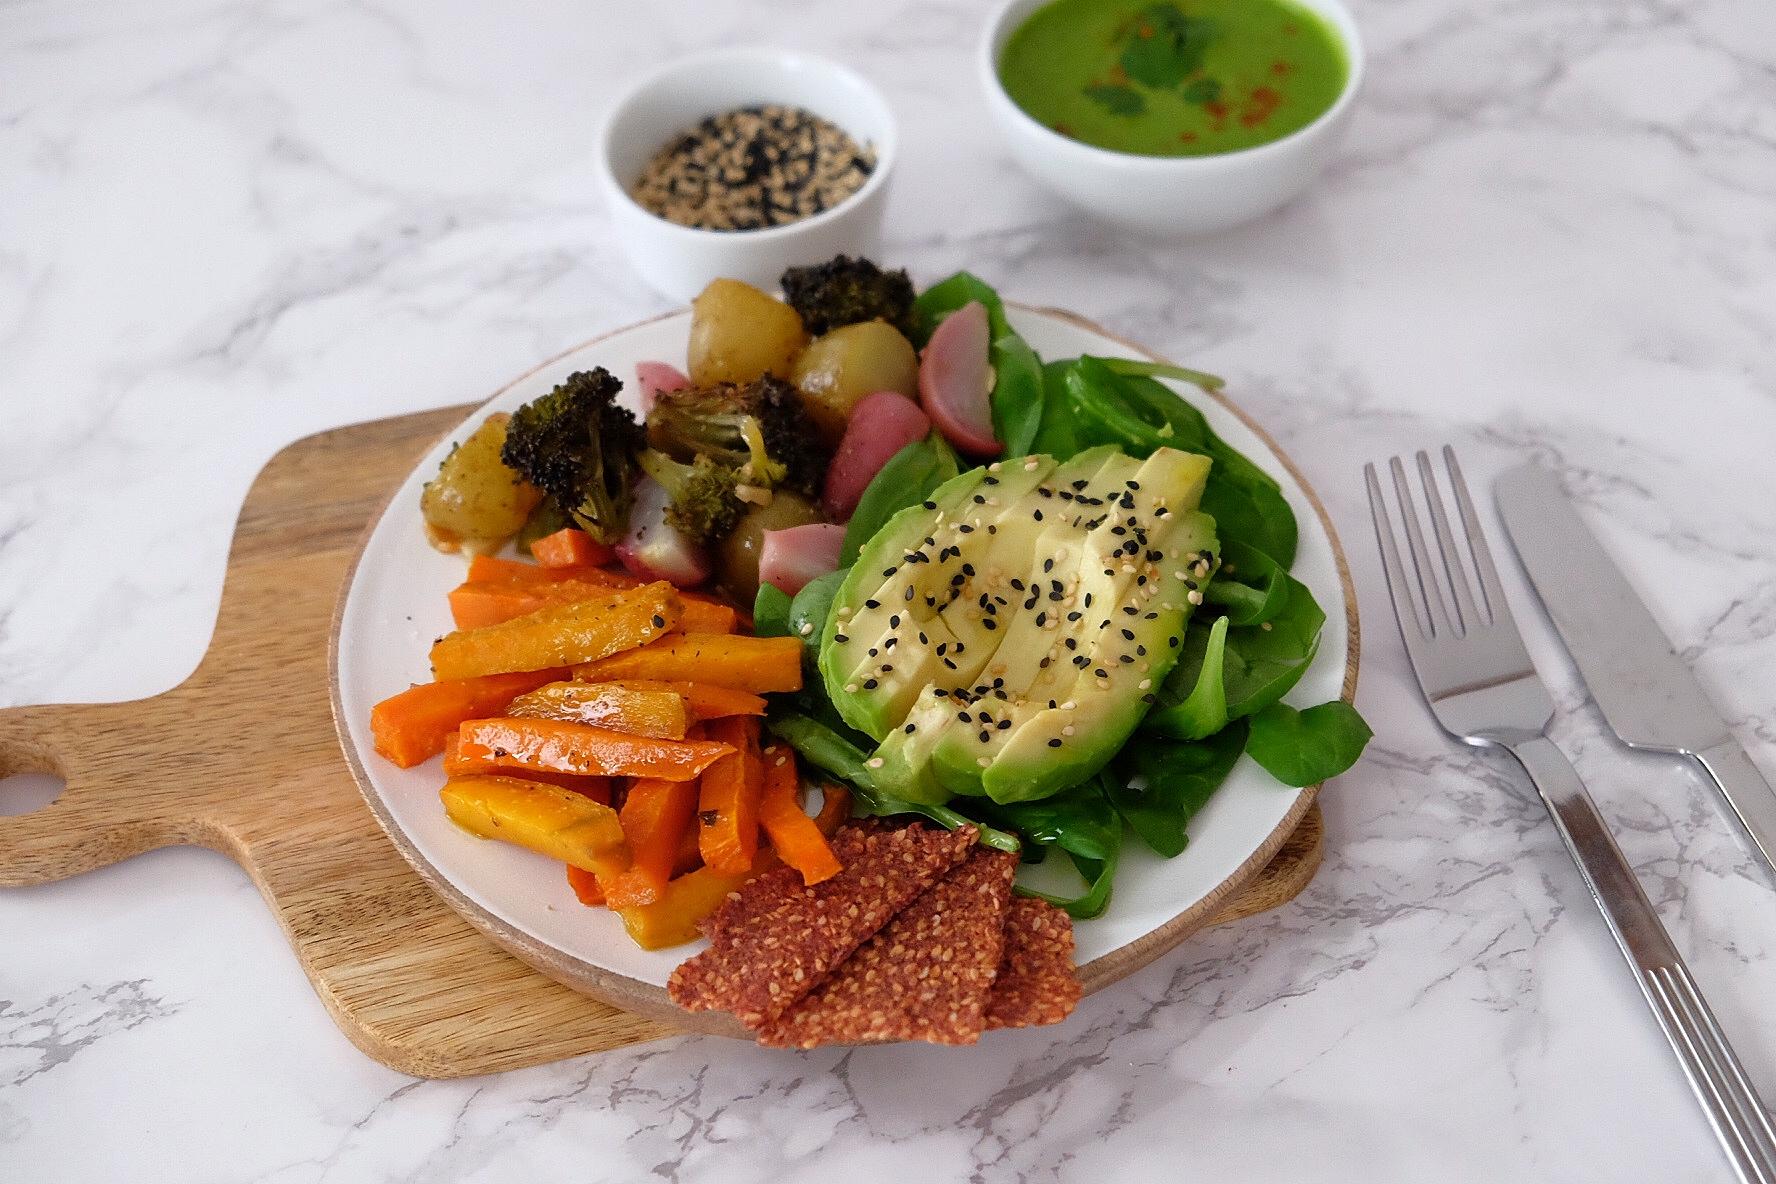 Ensalada de verduras asadas con su salsa tahini verde